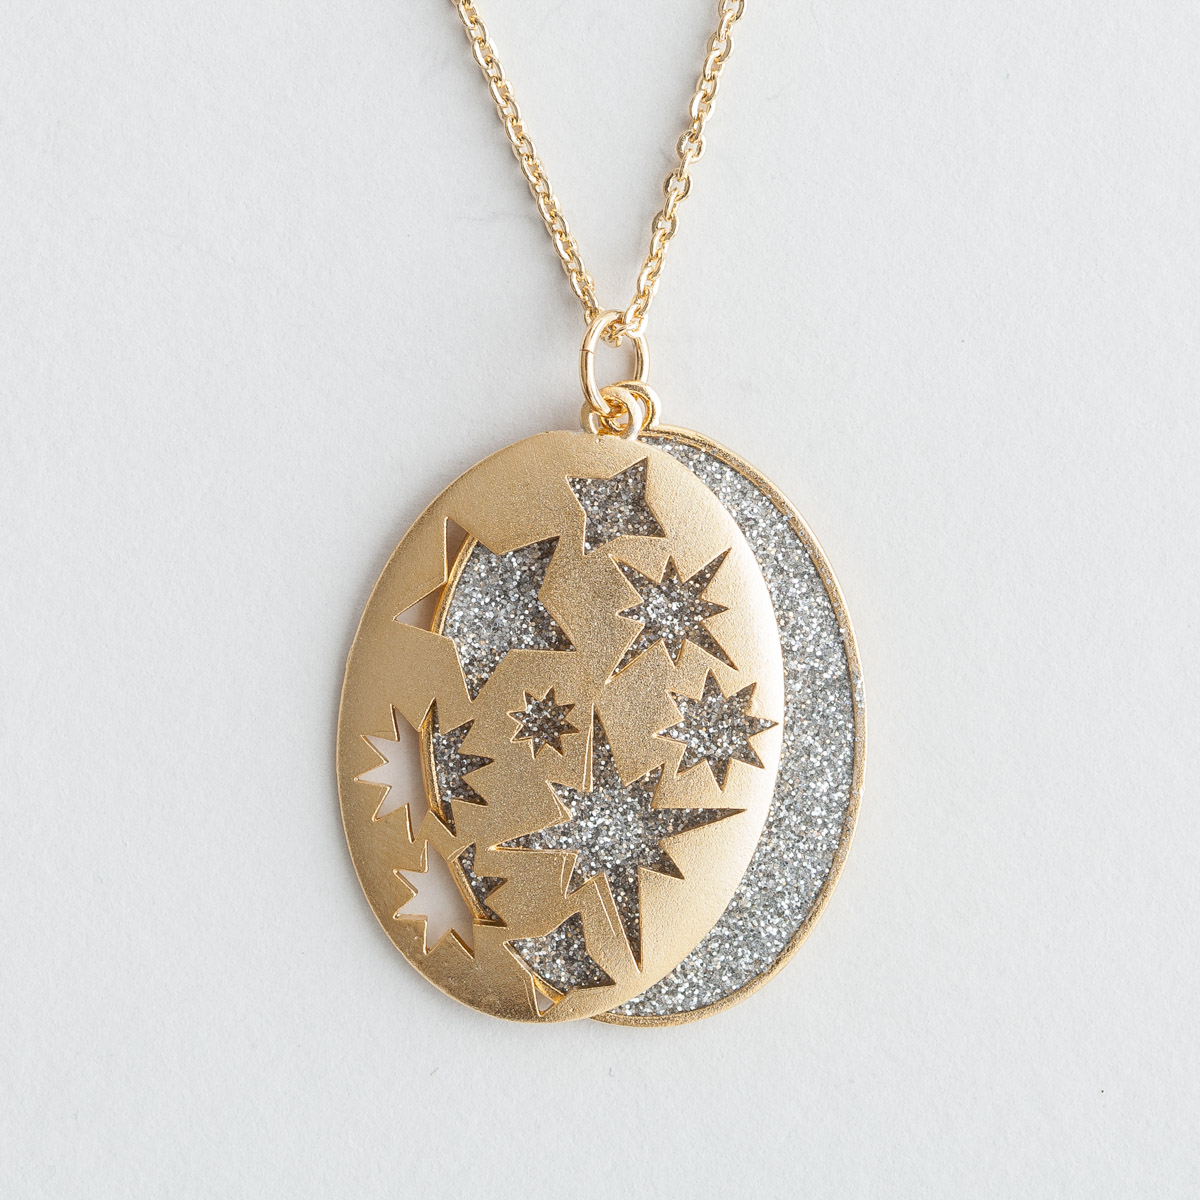 Everlasting Light - Layered Shimmer Necklace